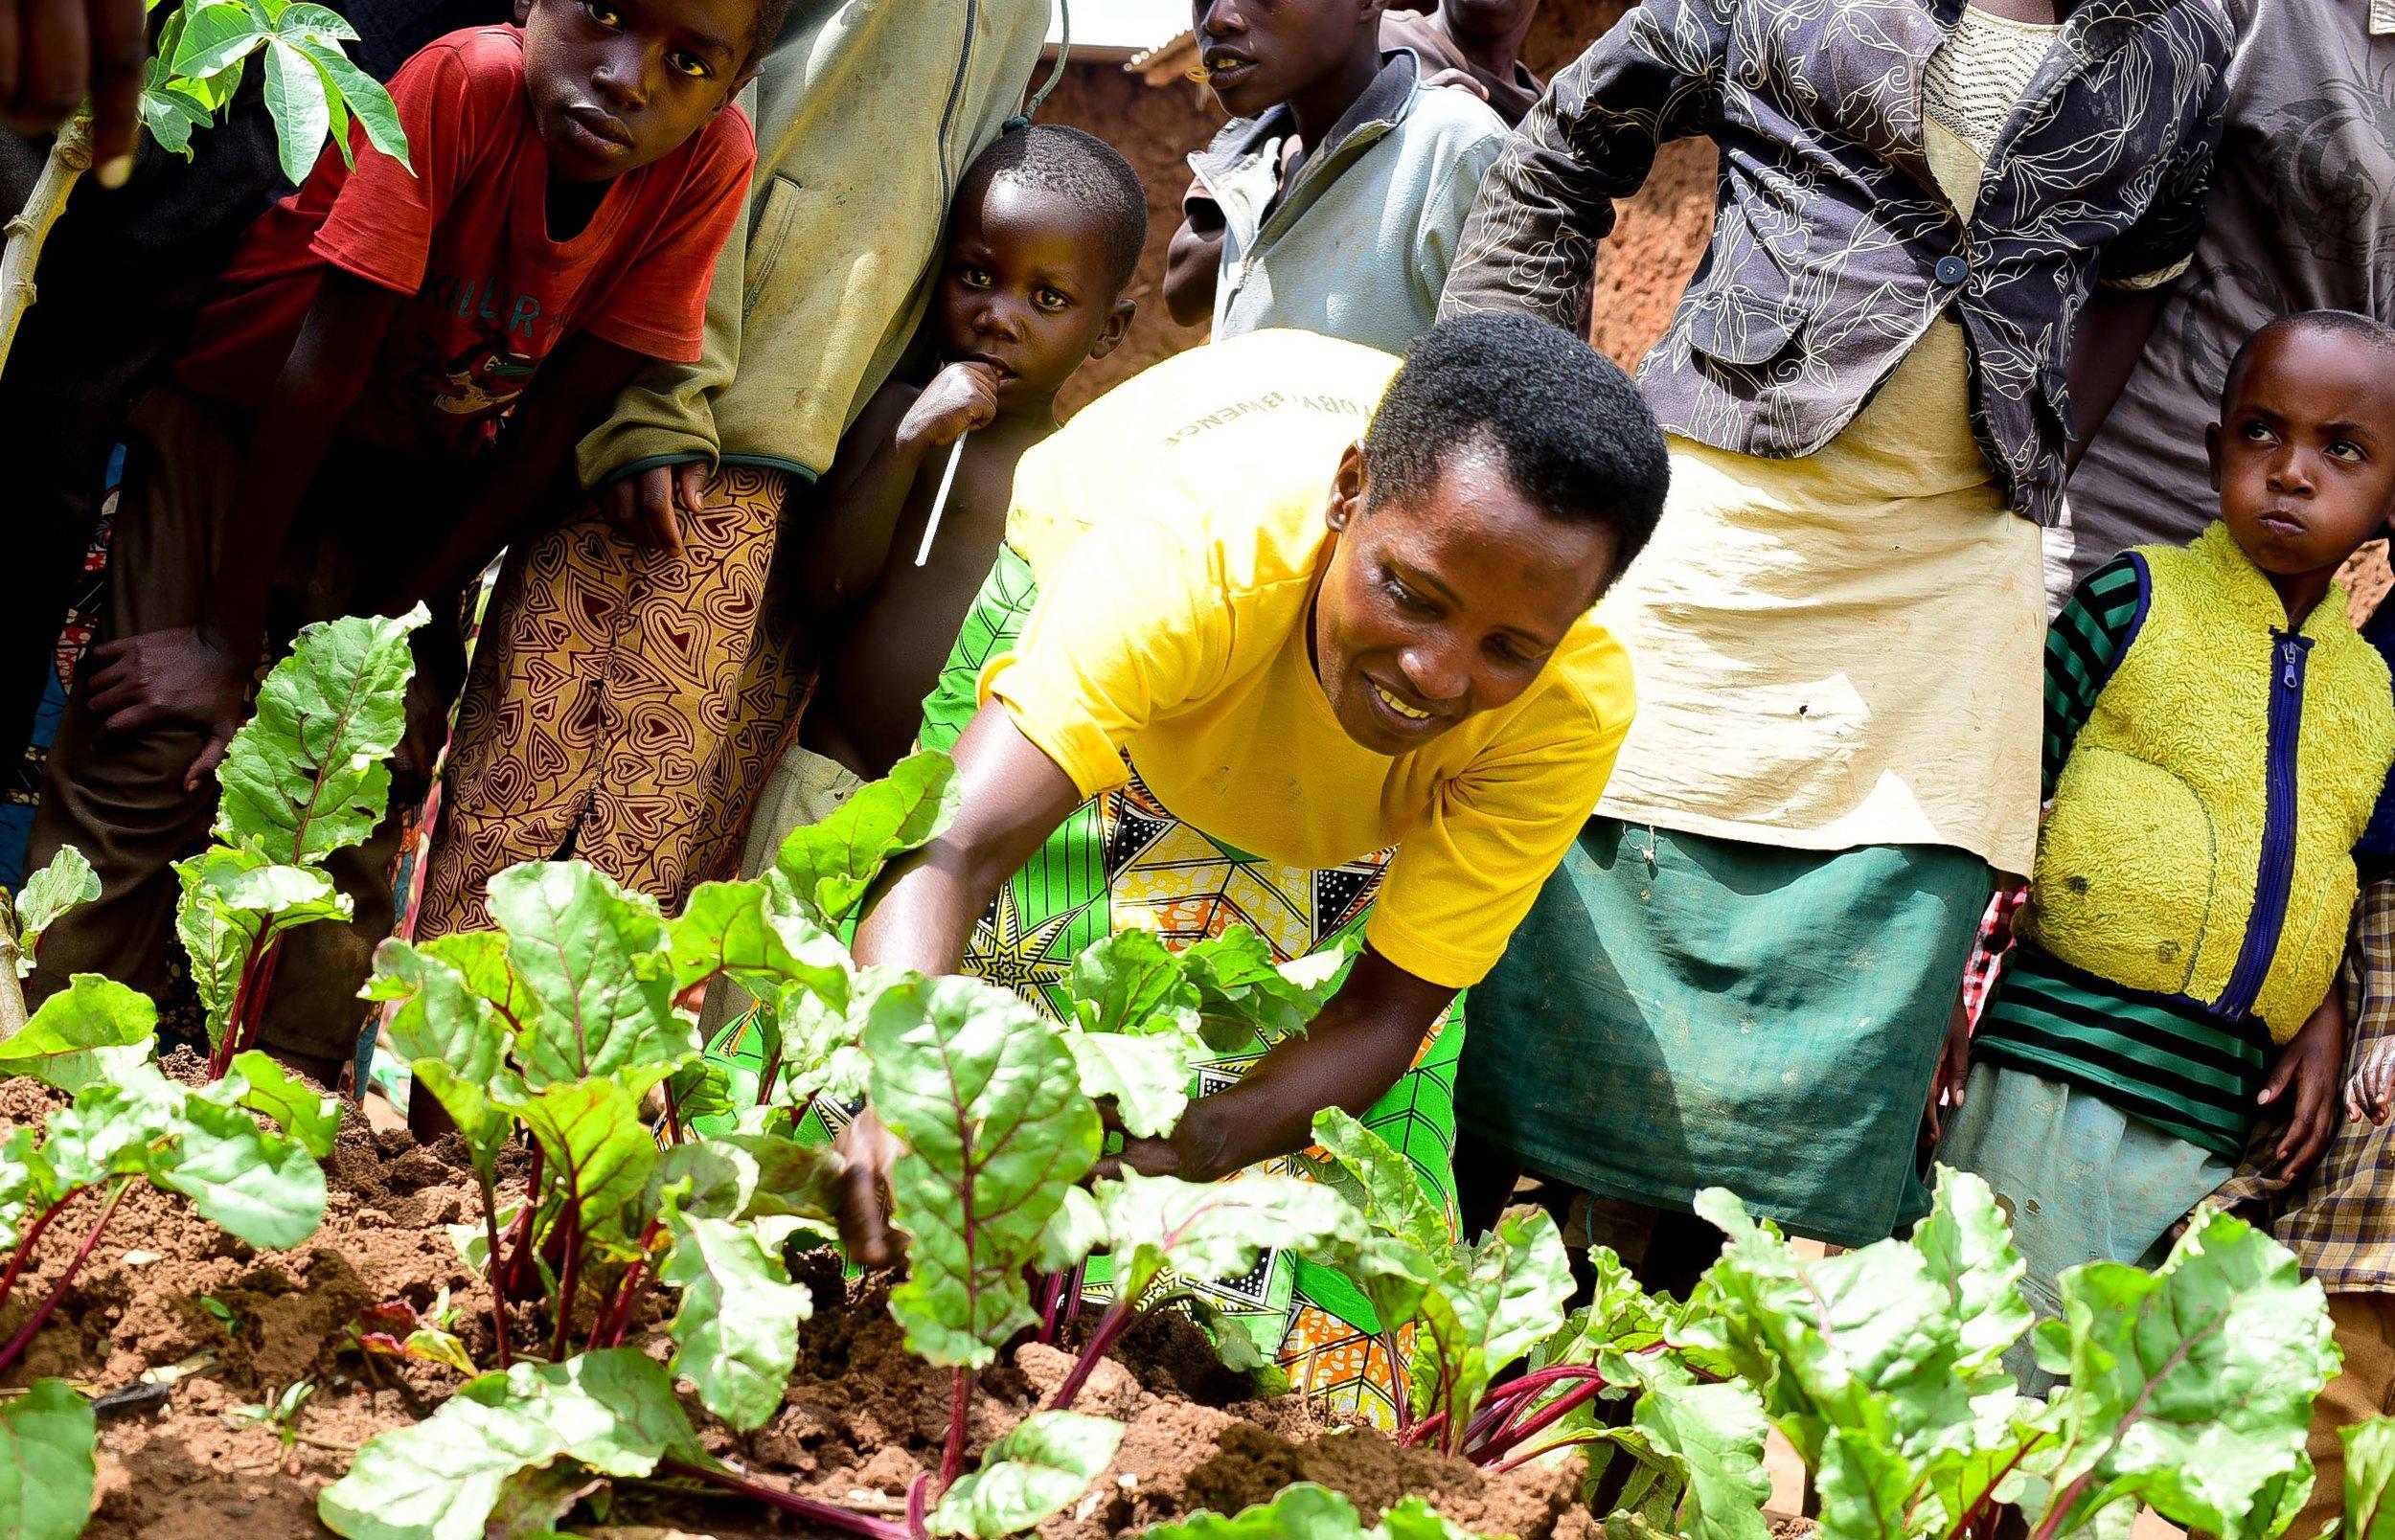 Beatrice arimo kwita ku karima ke k'igikoni mu nkambi ya Mahama, icumbikiye impuzi z'abarundi zisaga 50,000 bahunze amakimbirane mu Burundi.